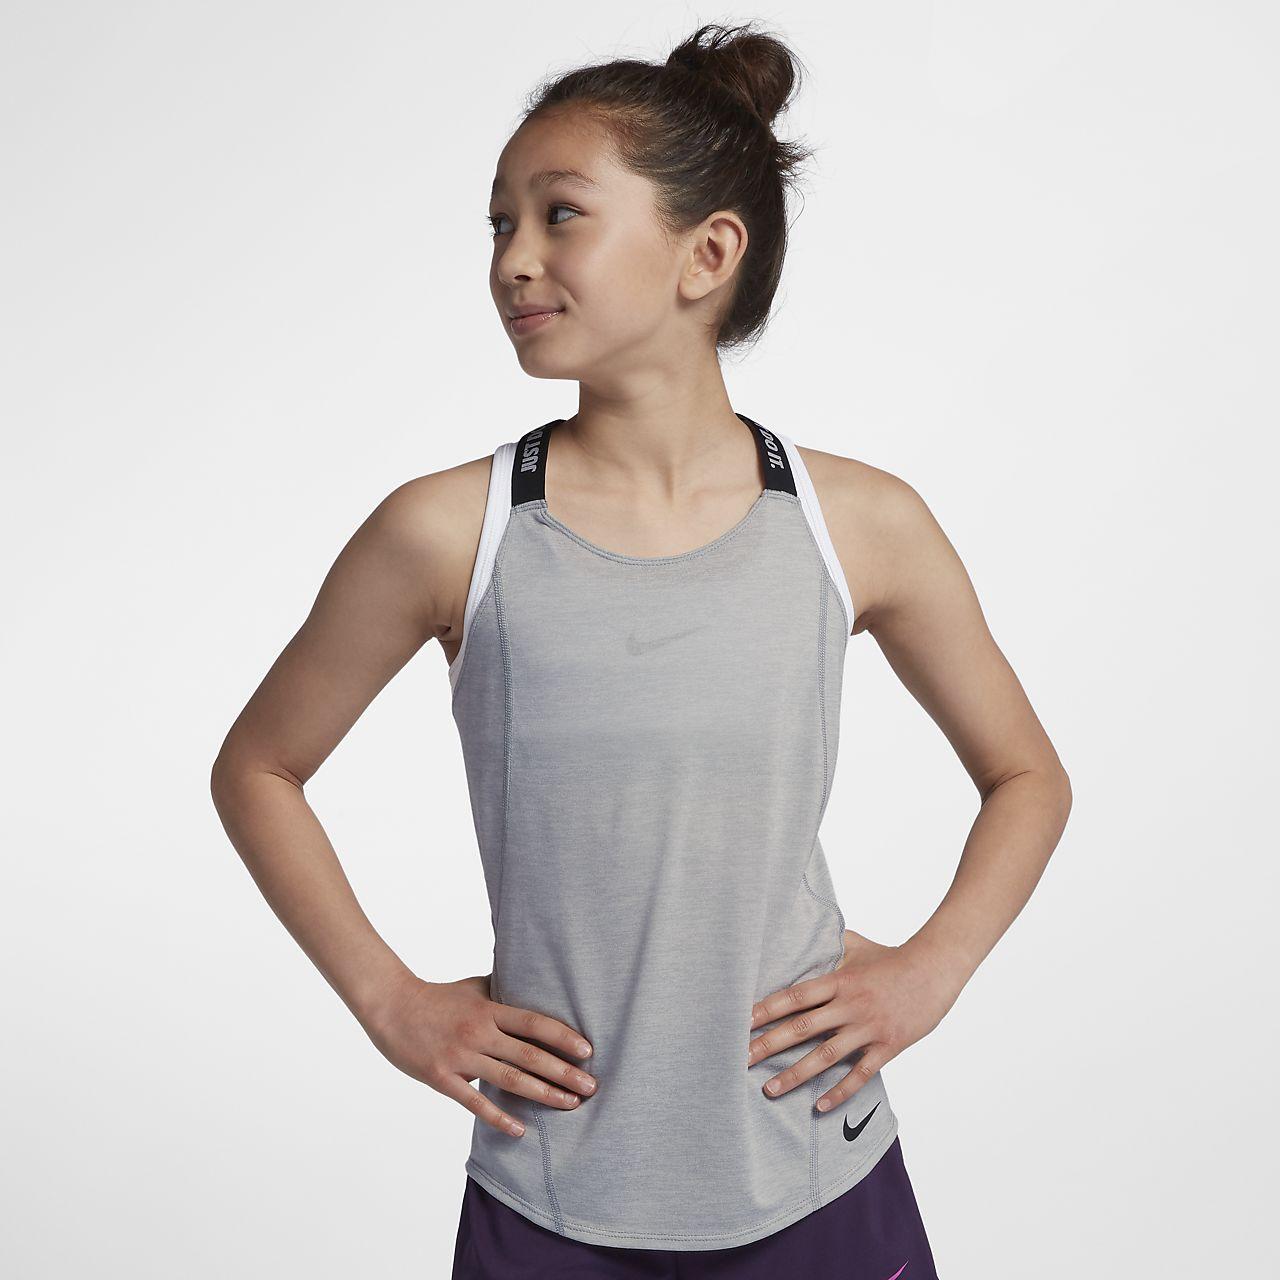 Camisola de treino sem mangas Nike Dri-FIT Júnior (Rapariga)